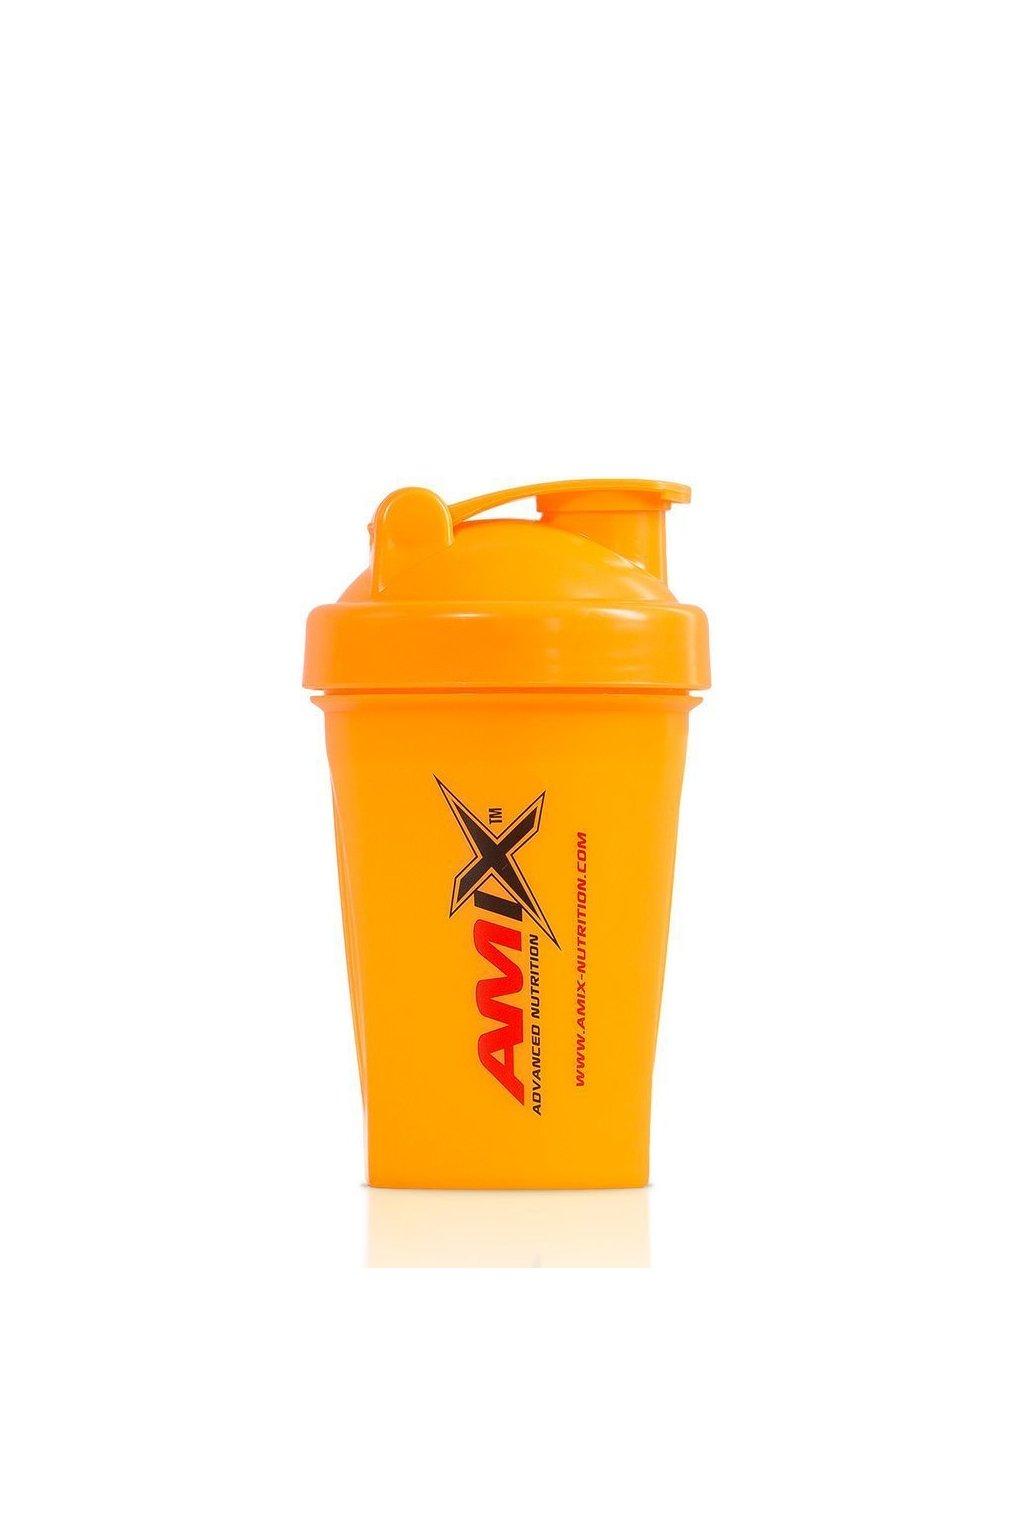 AX 00252 orange 4